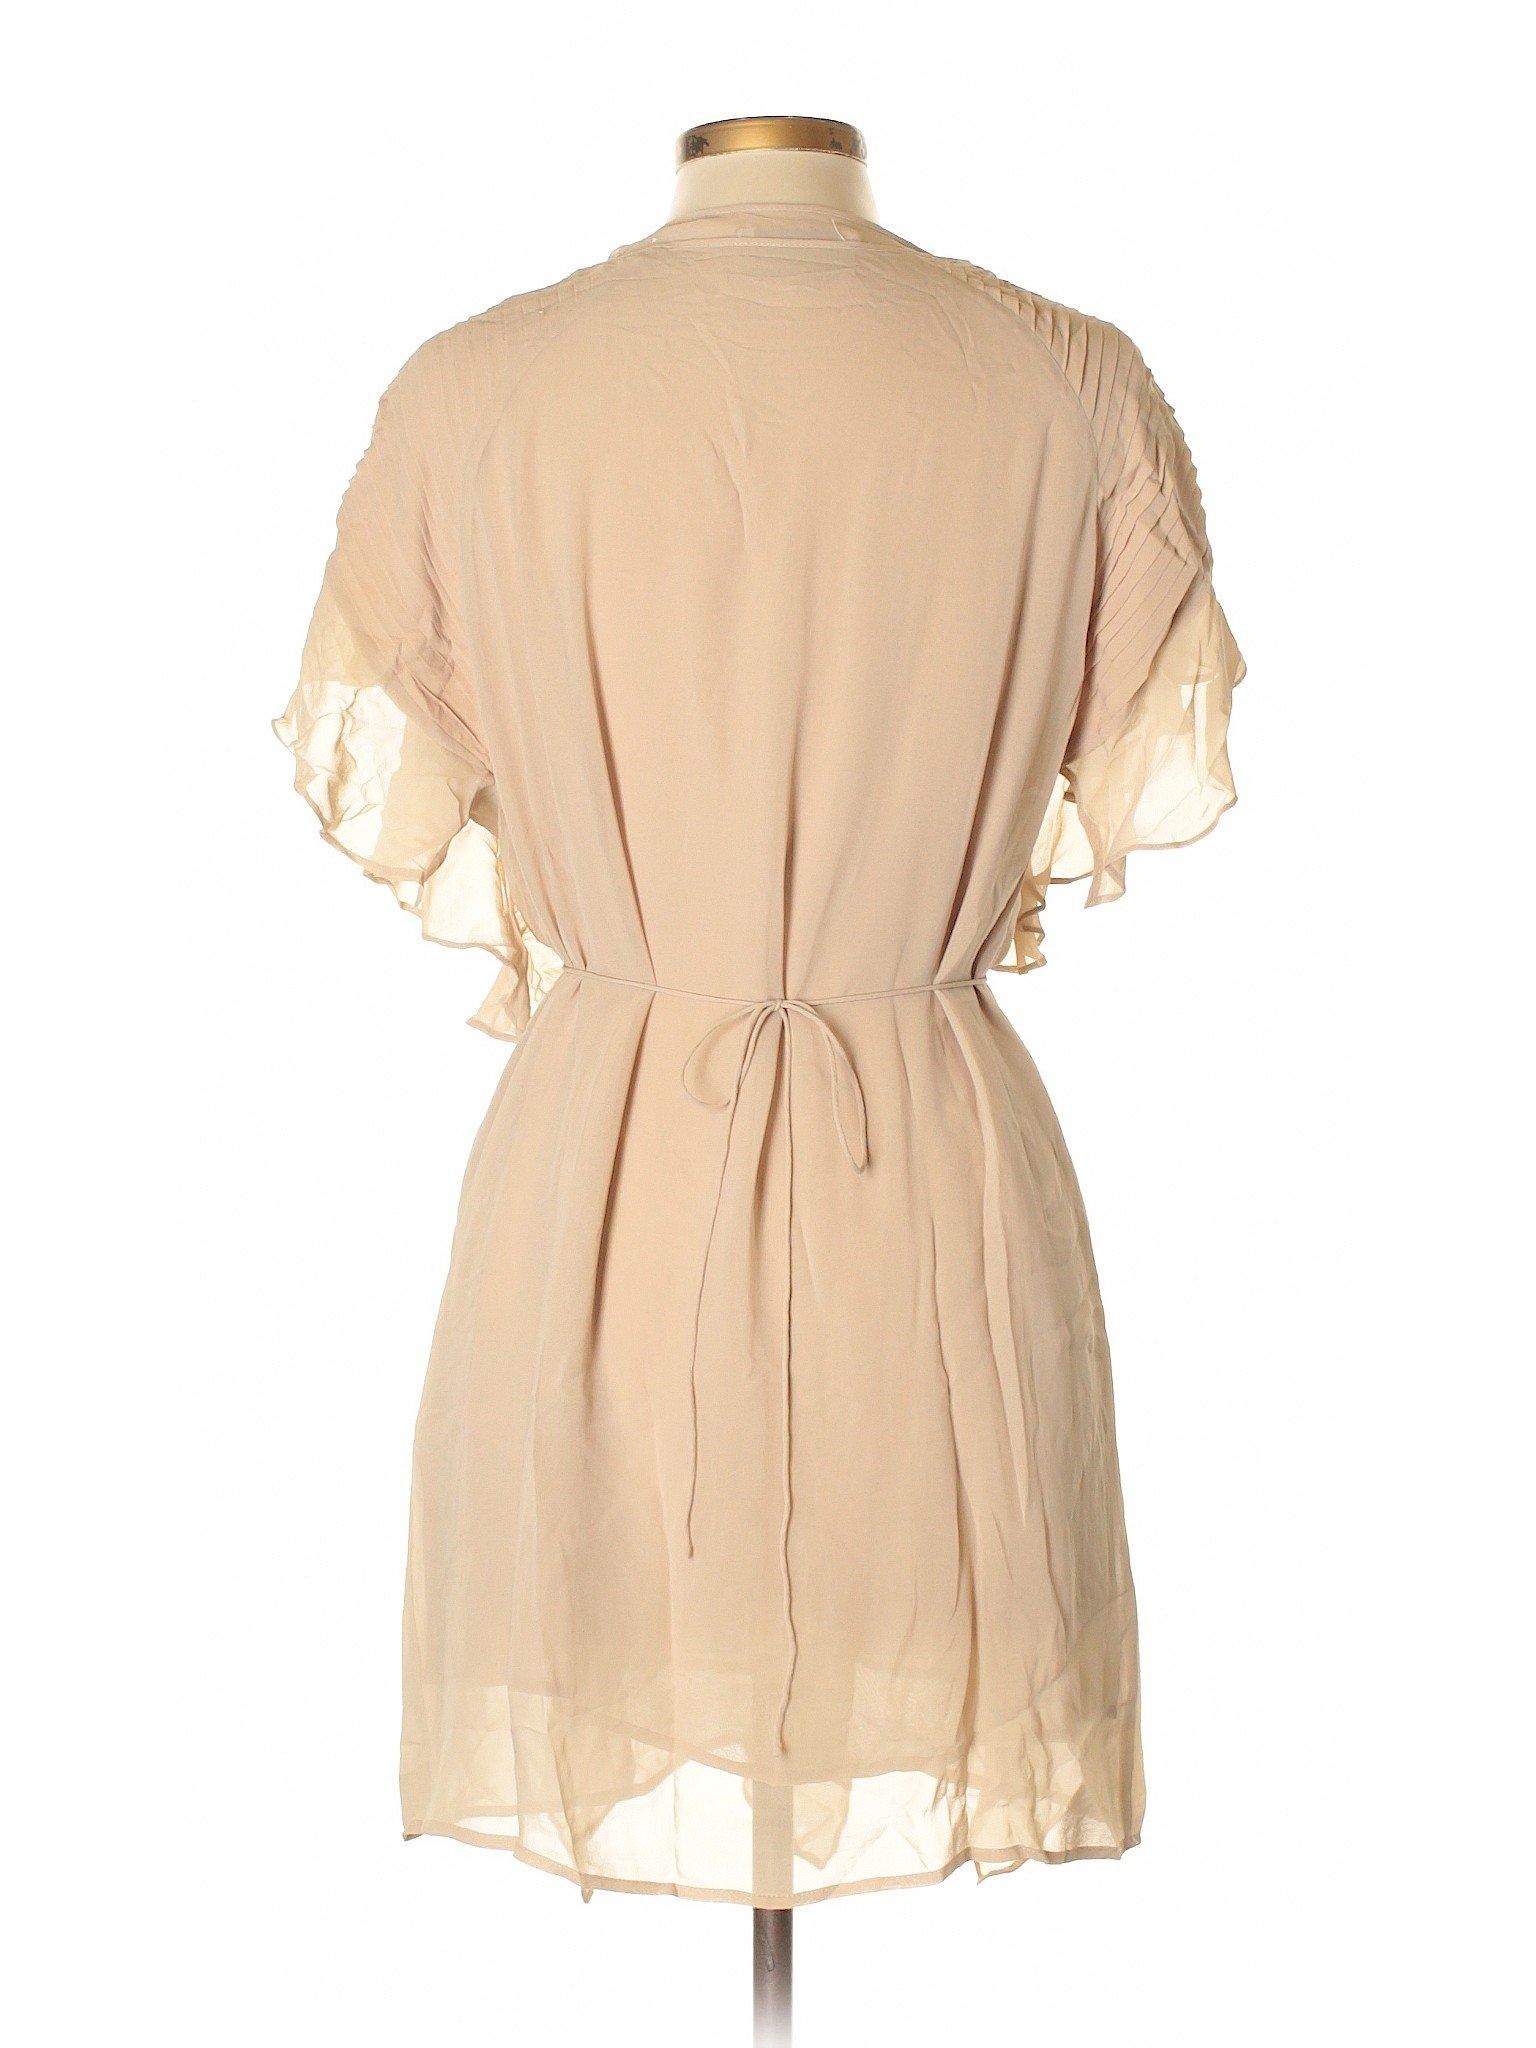 winter Casual Boutique Madison Marcus Dress d6xw4dtqvz